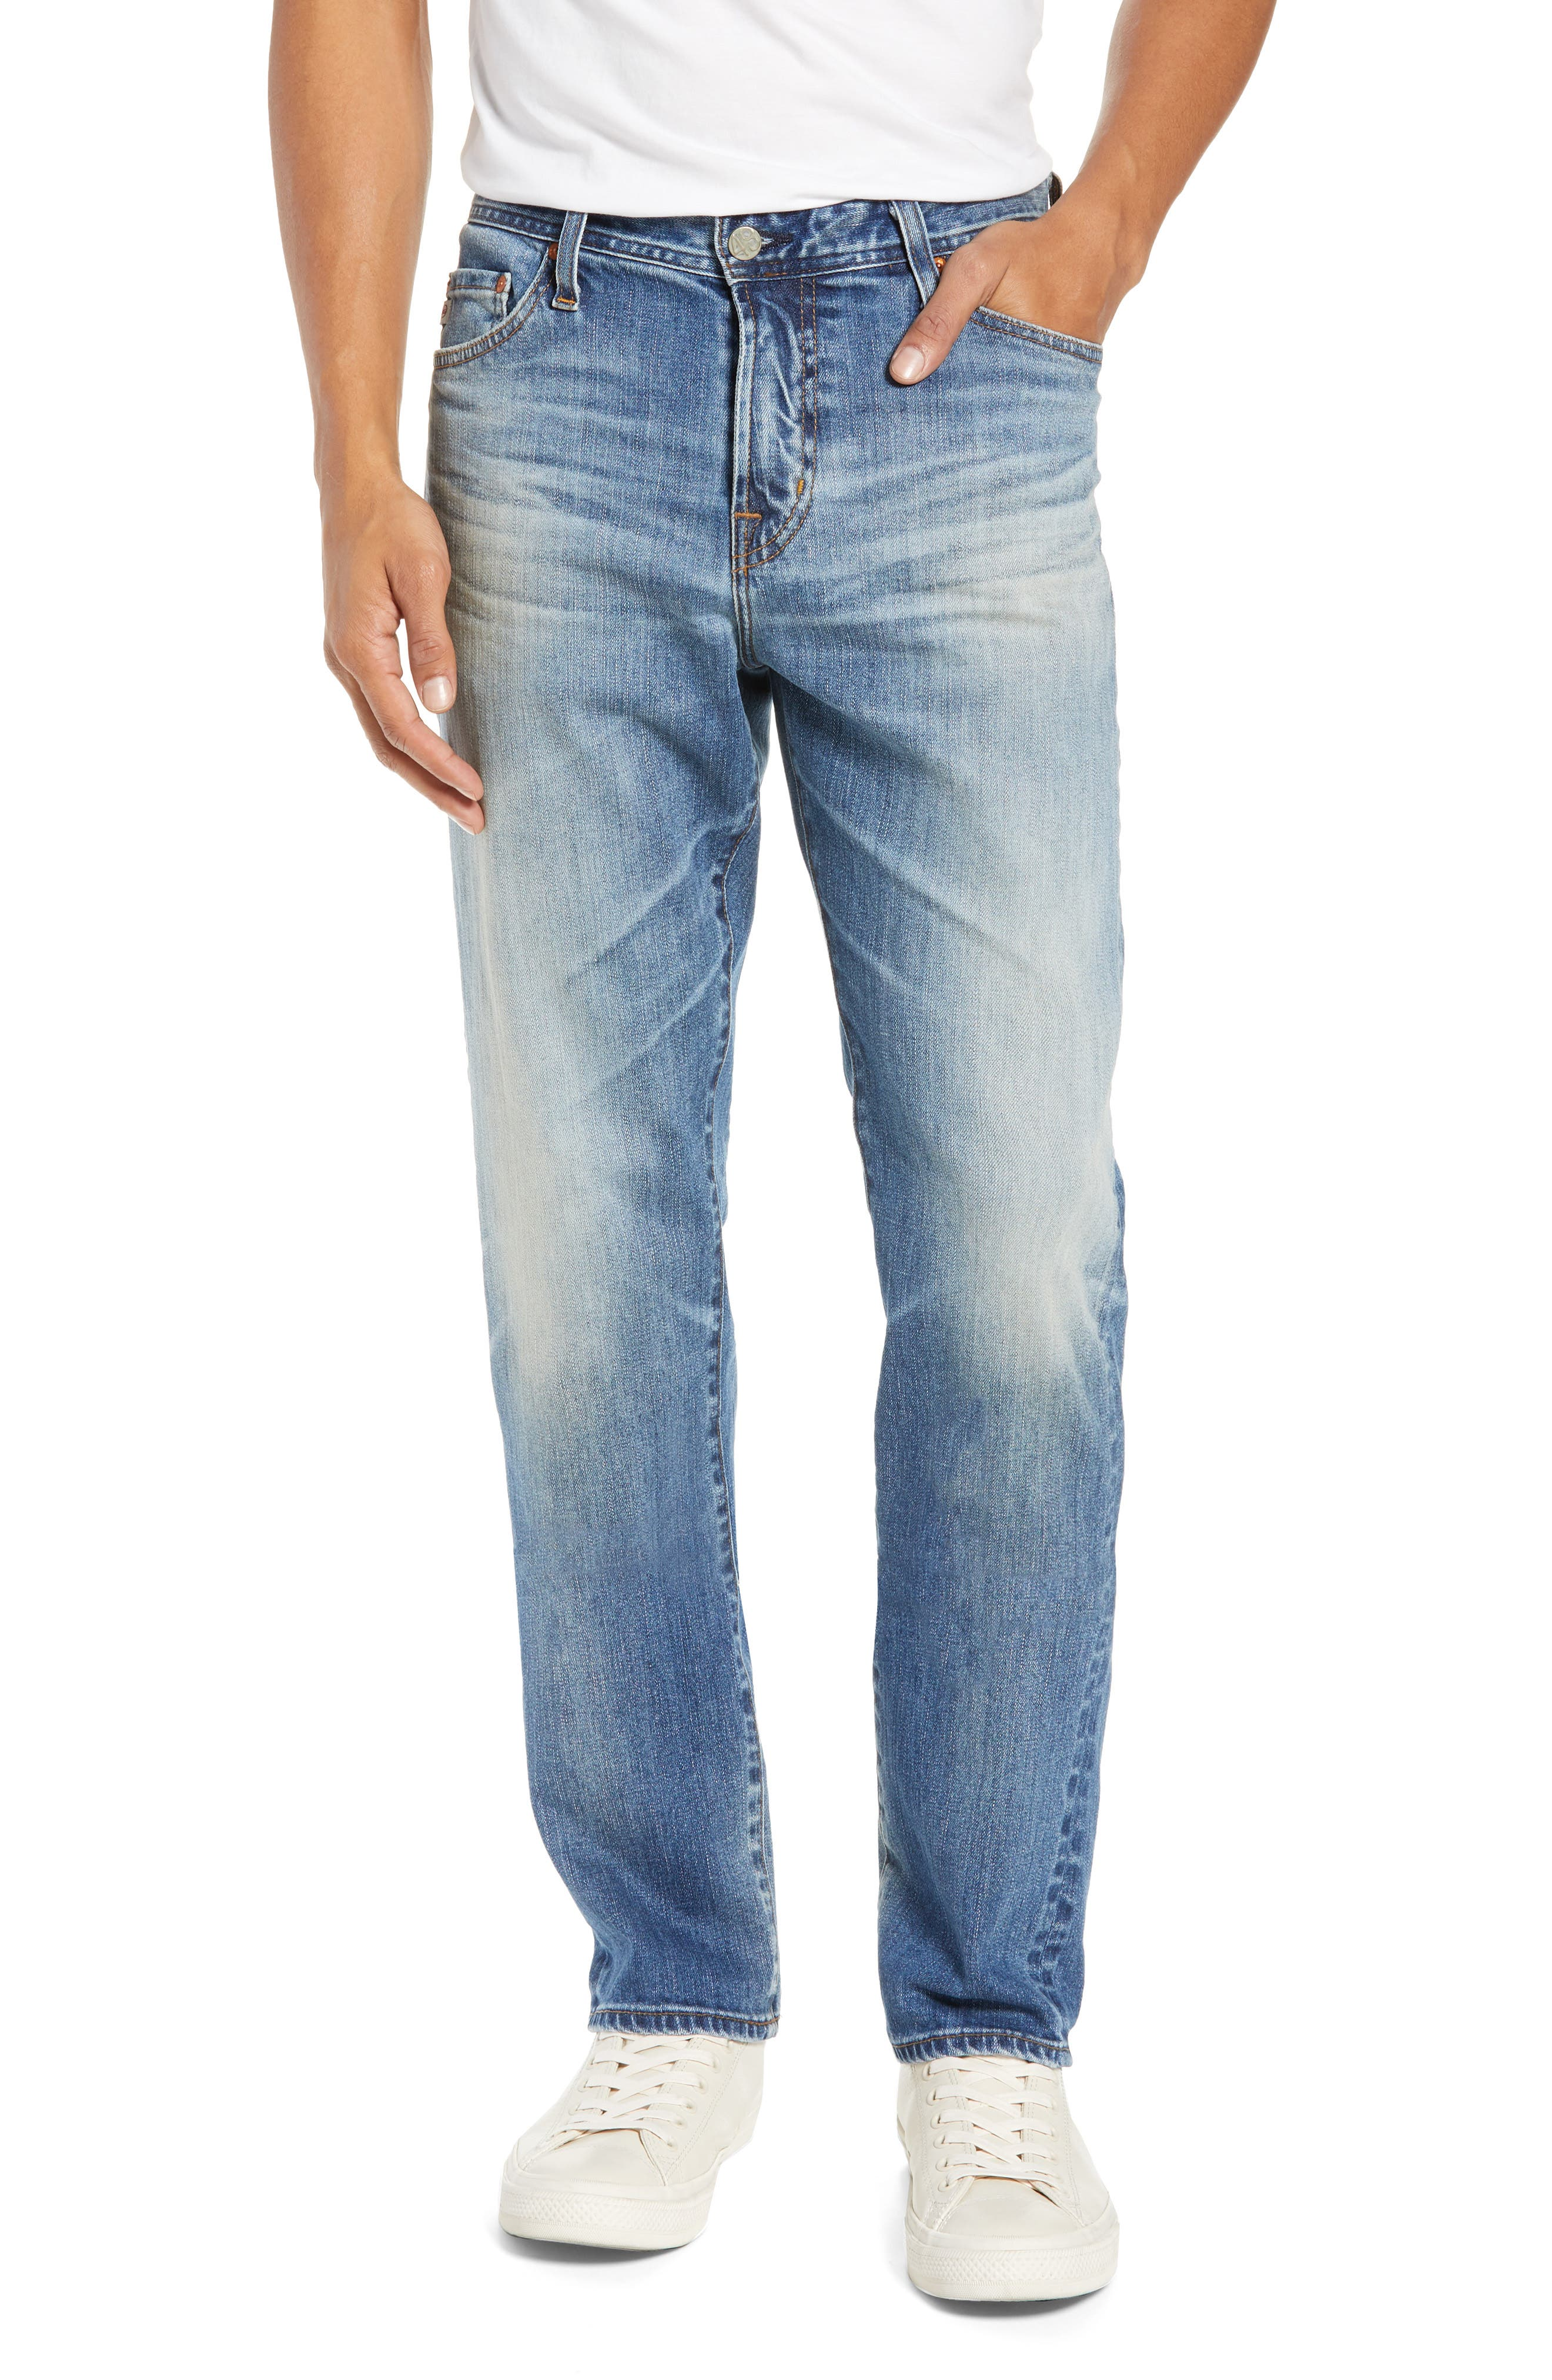 Everett Slim Straight Leg Jeans, Main, color, 21 YEARS SEIZE